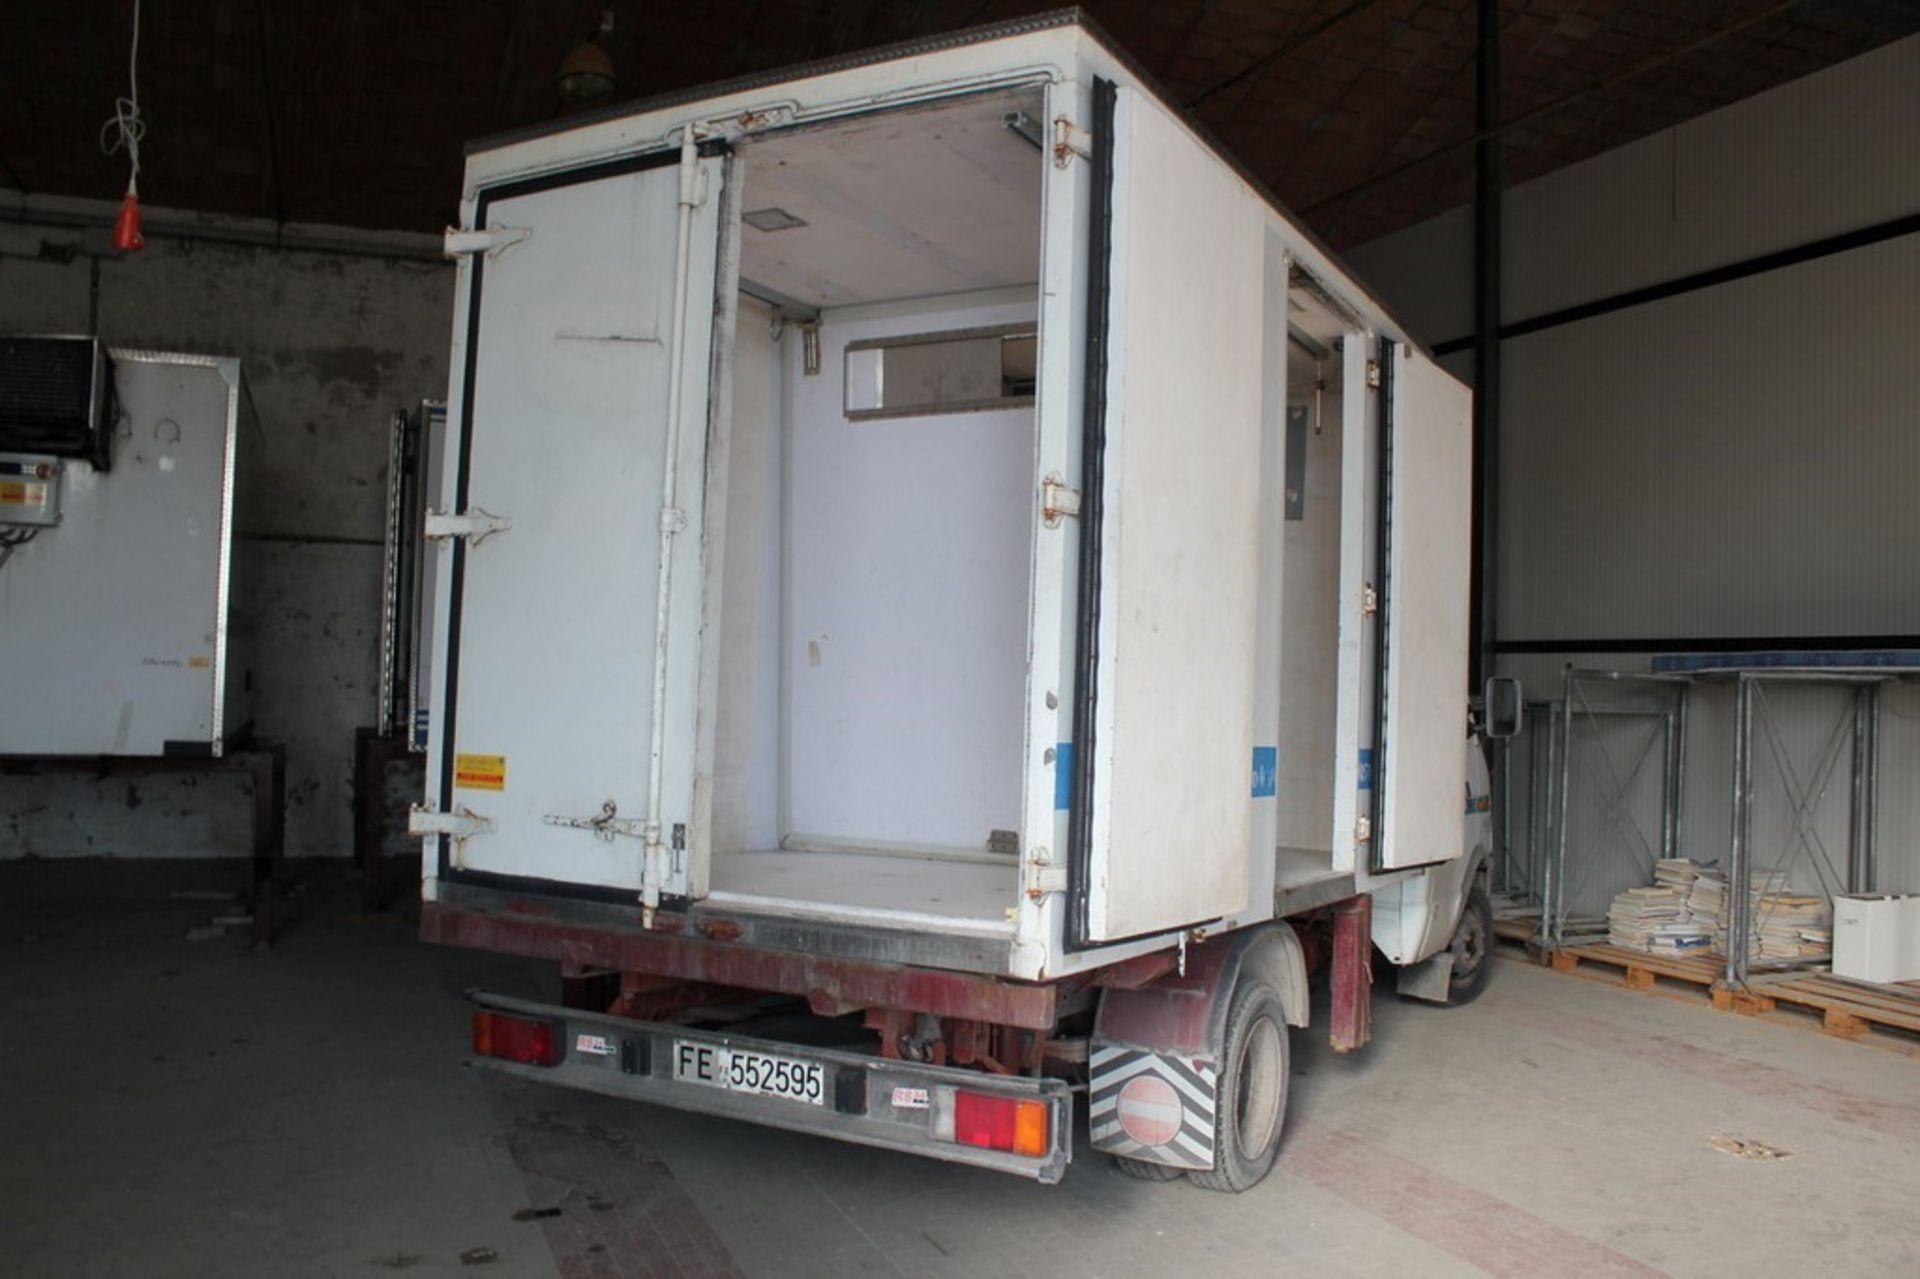 Lot 154 - N. 78 (716 IVG FALLIMENTO) AUTOCARRO IVECO 35.12 TG. FE552595